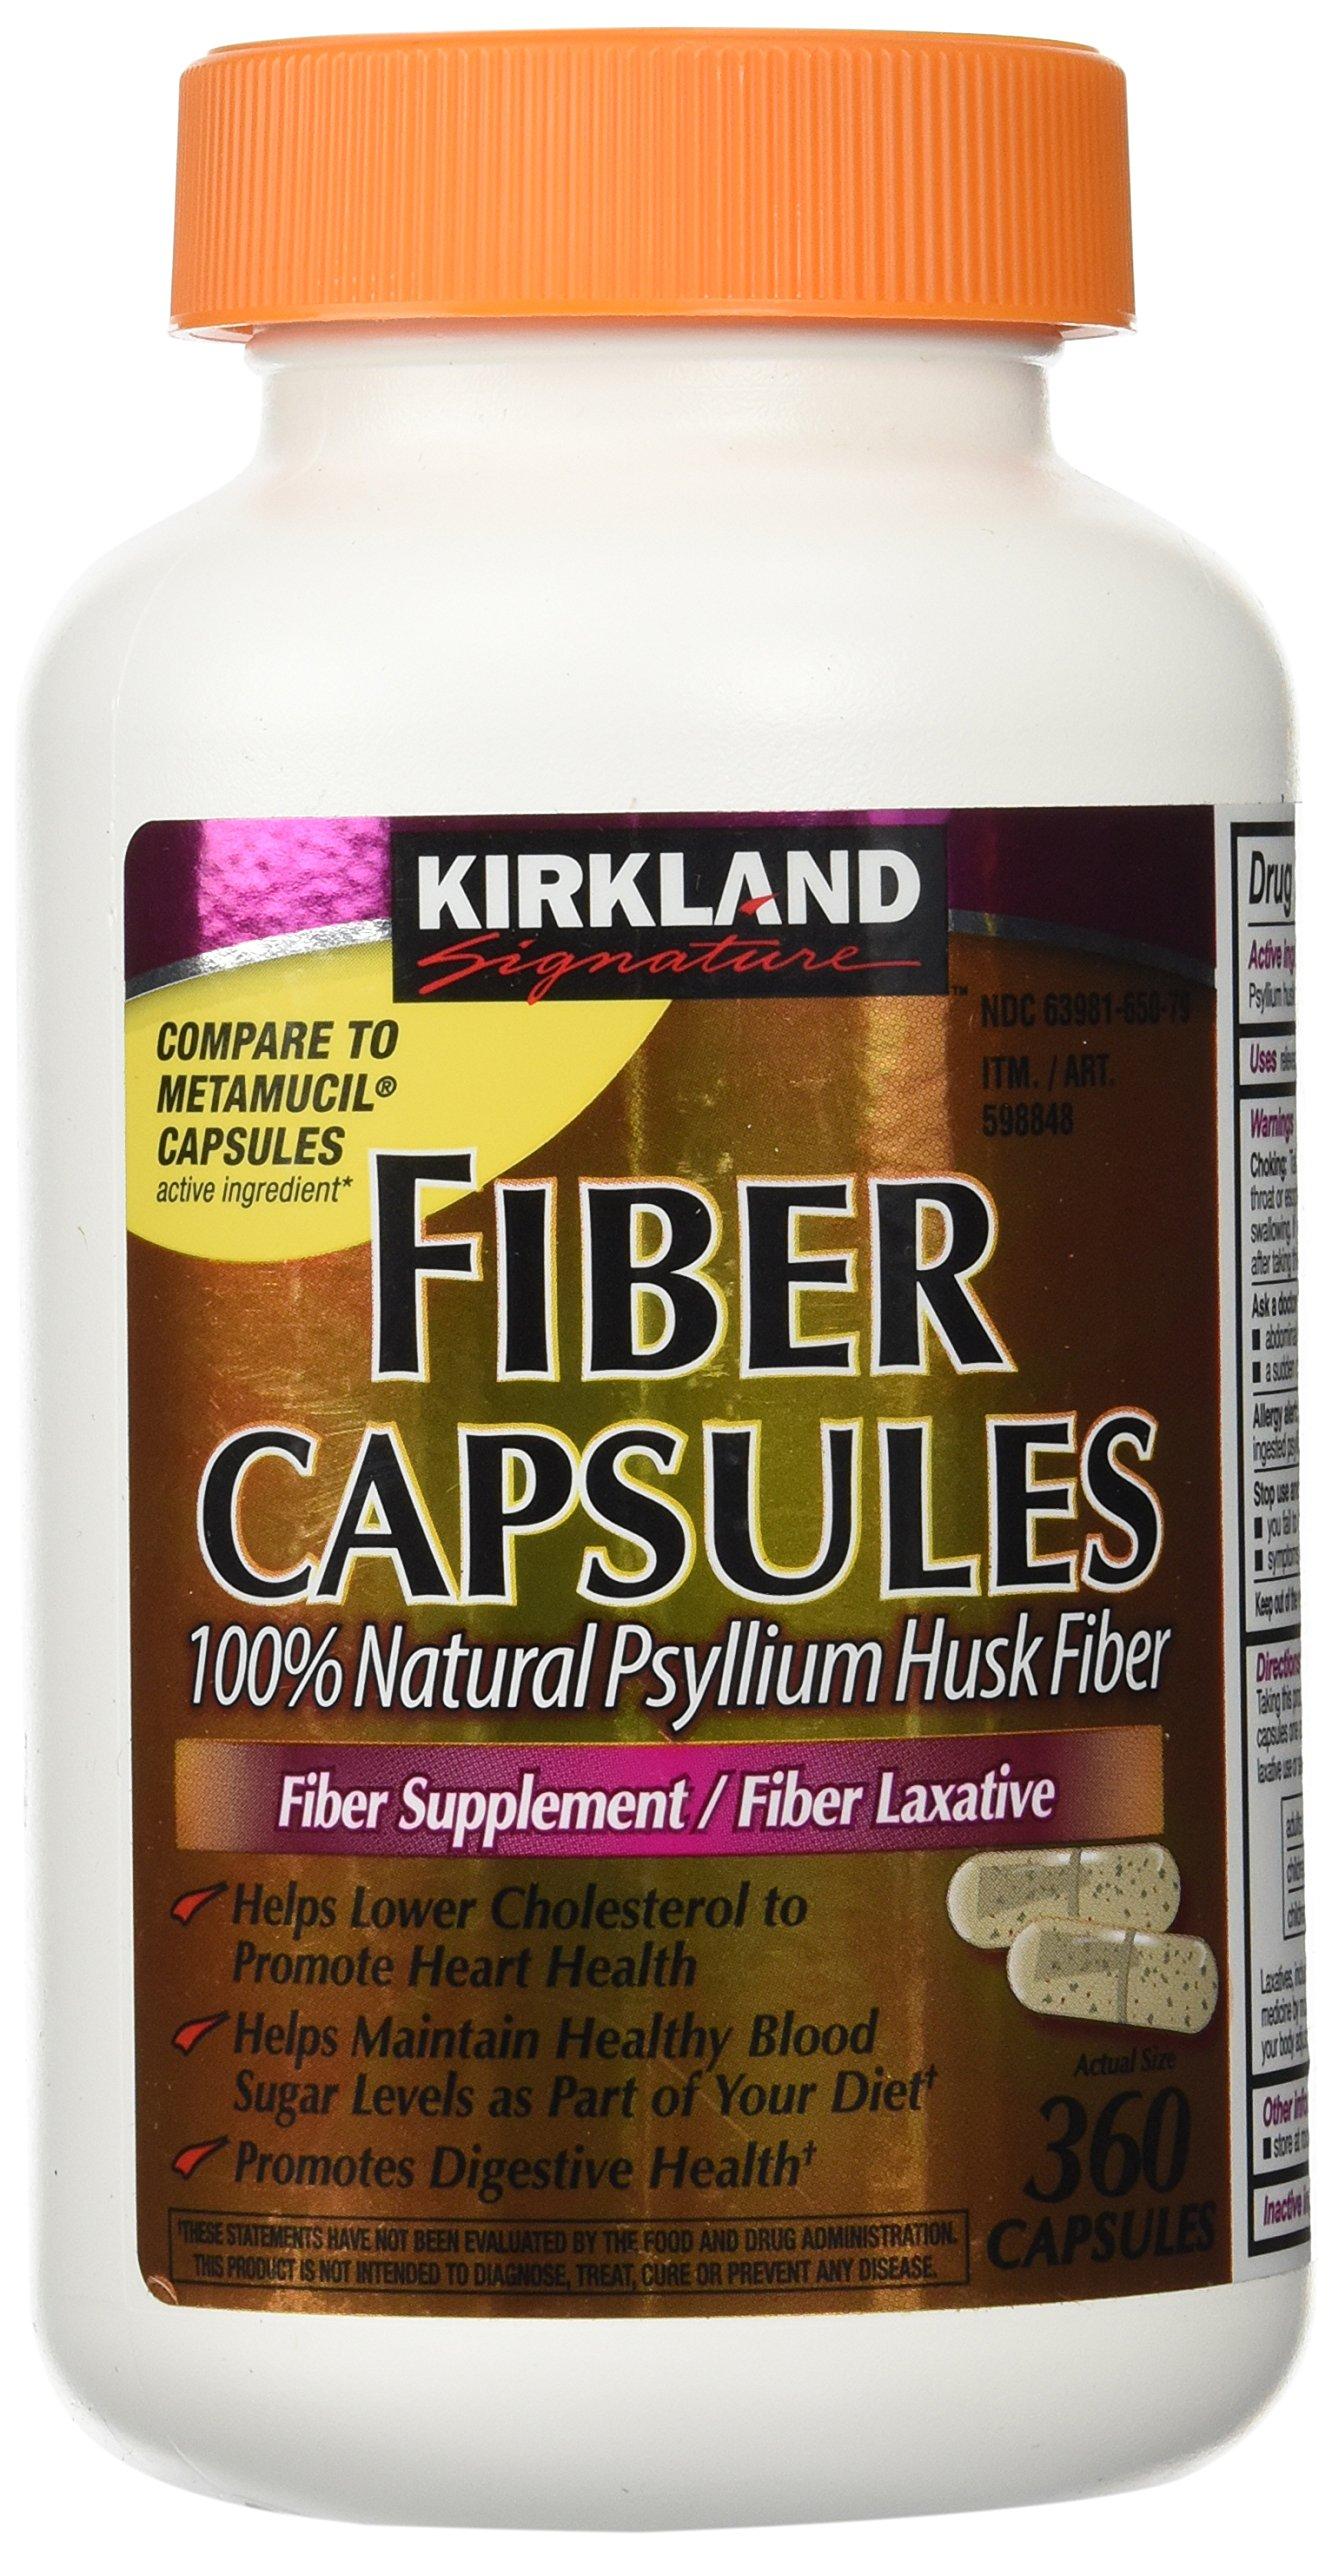 Fiber Capsules Kirkland Therapy for Regularity/Fiber Supplement, 360 capsules - Compare to the Active Ingredient in Metamucil Capsules